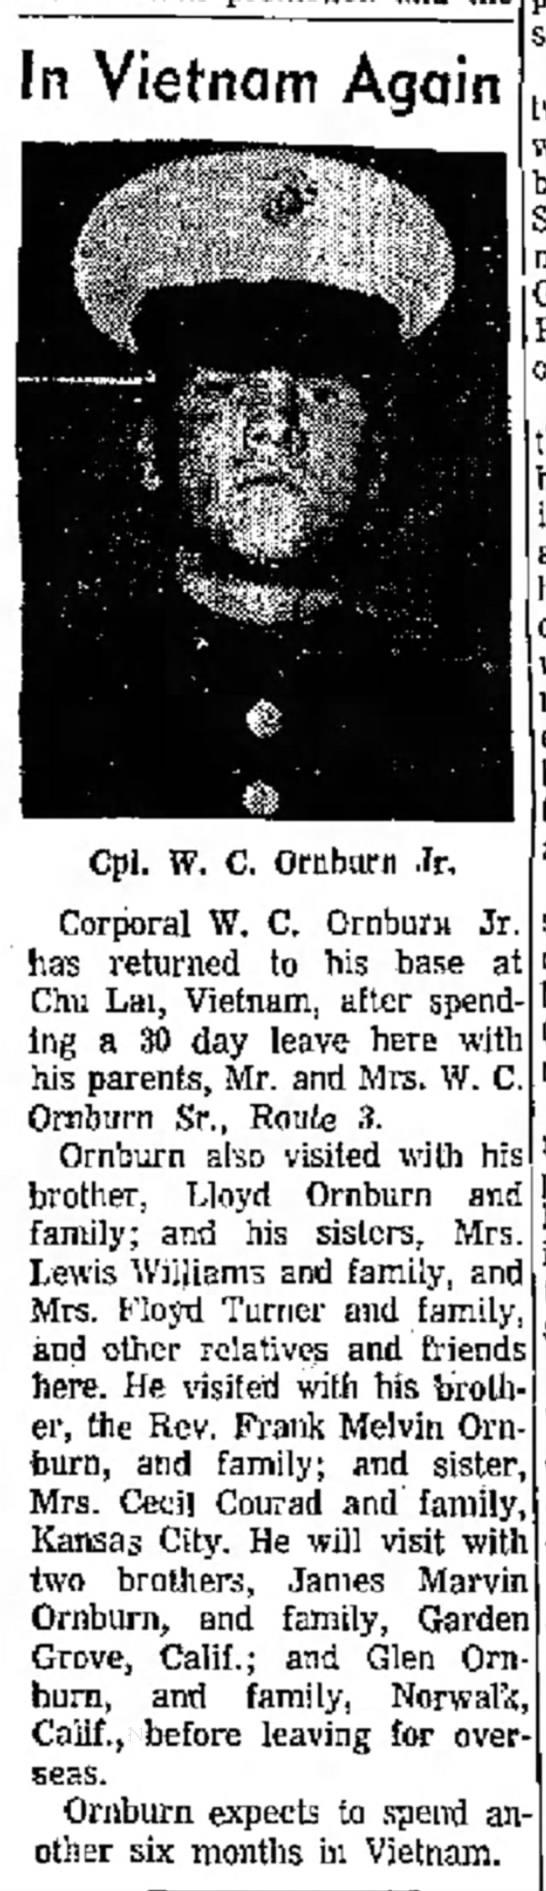 Bill Ornburn back to Veitnam -